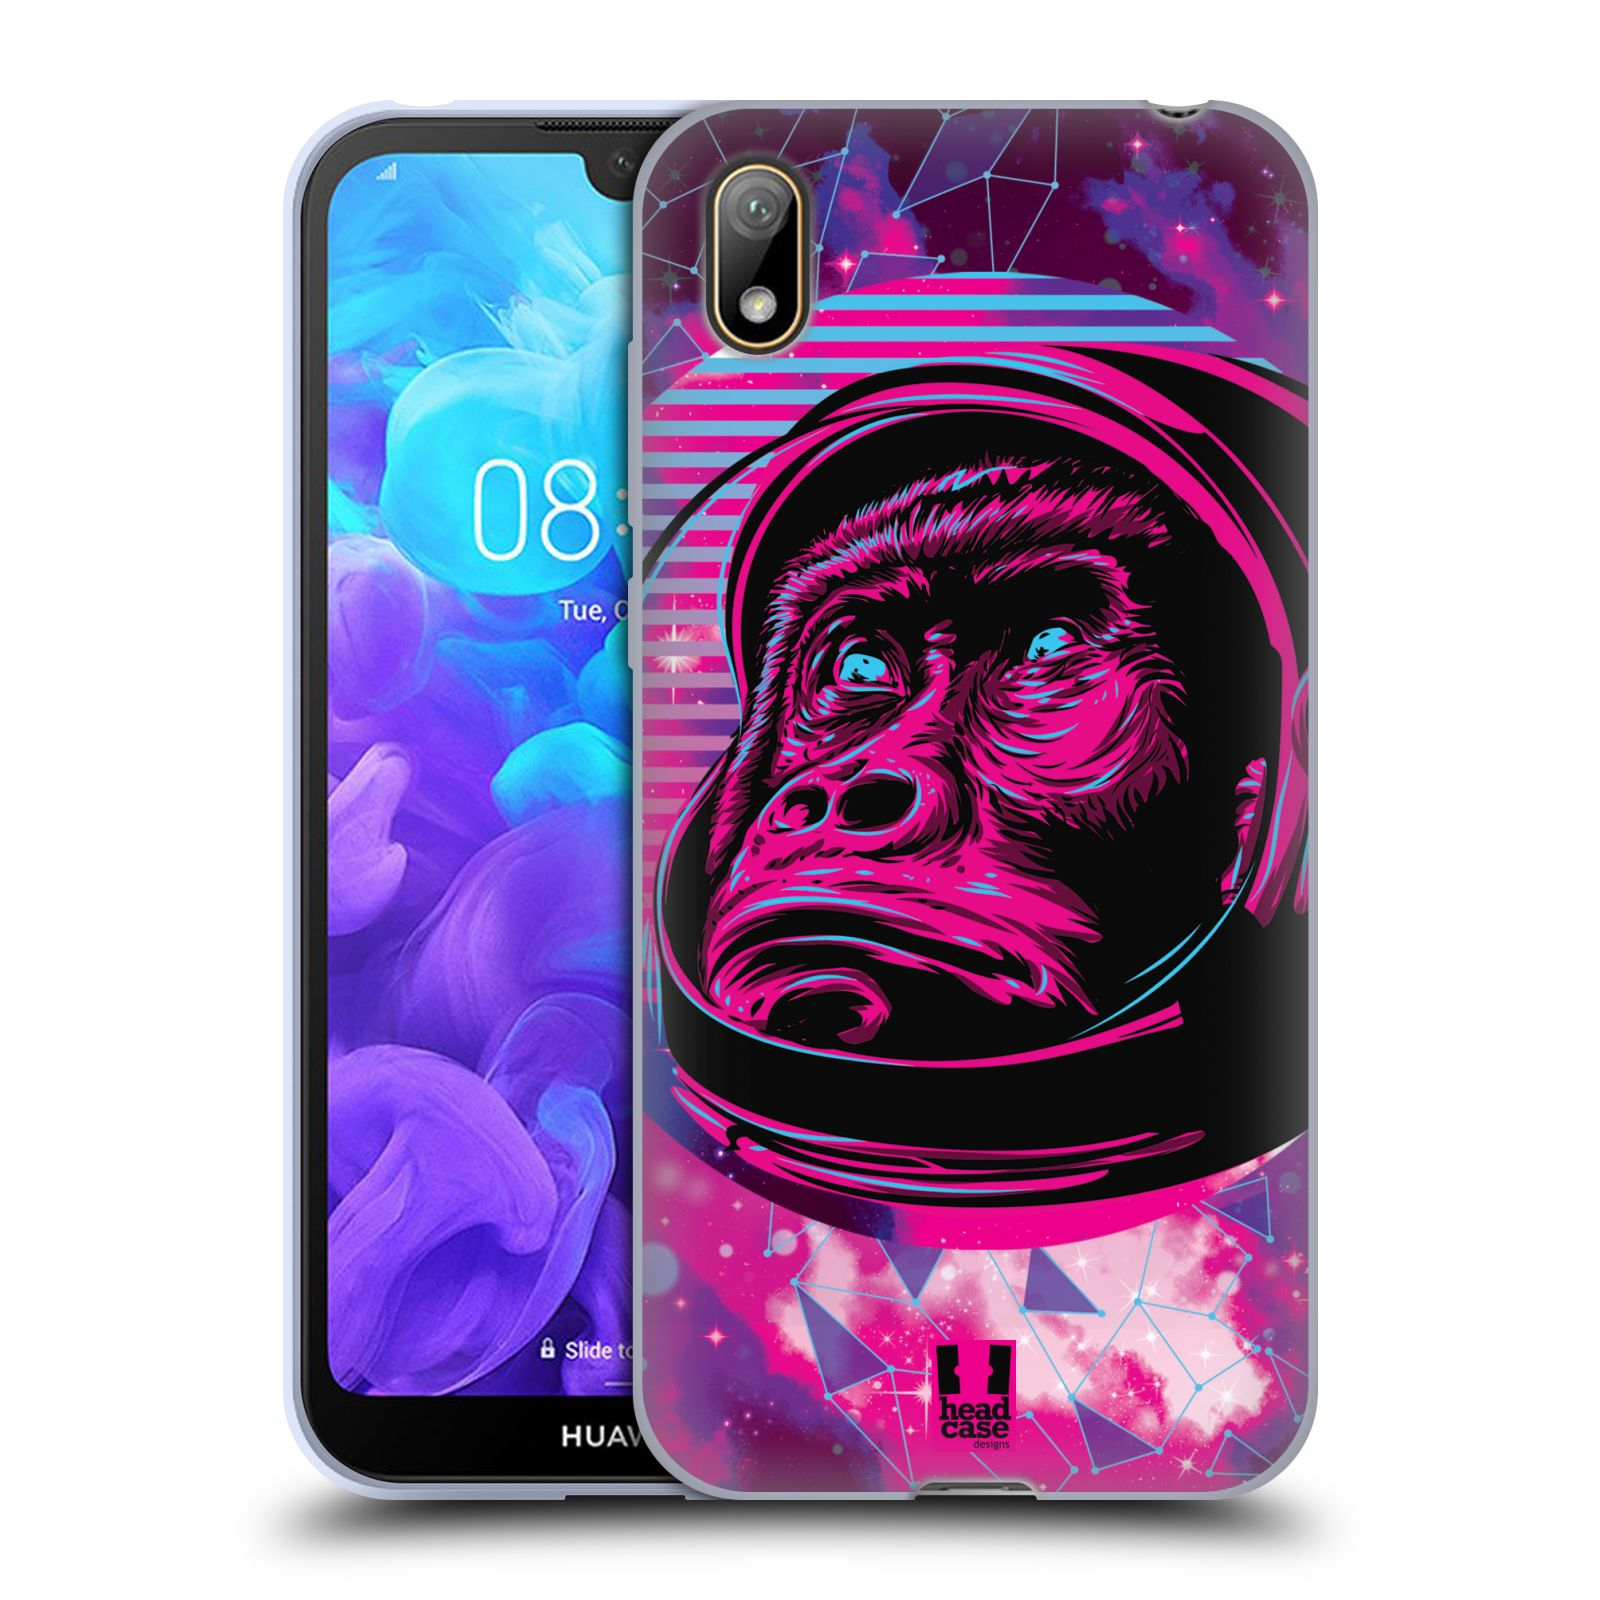 Silikonové pouzdro na mobil Huawei Y5 (2019) - Head Case - Gorila ve skafandru